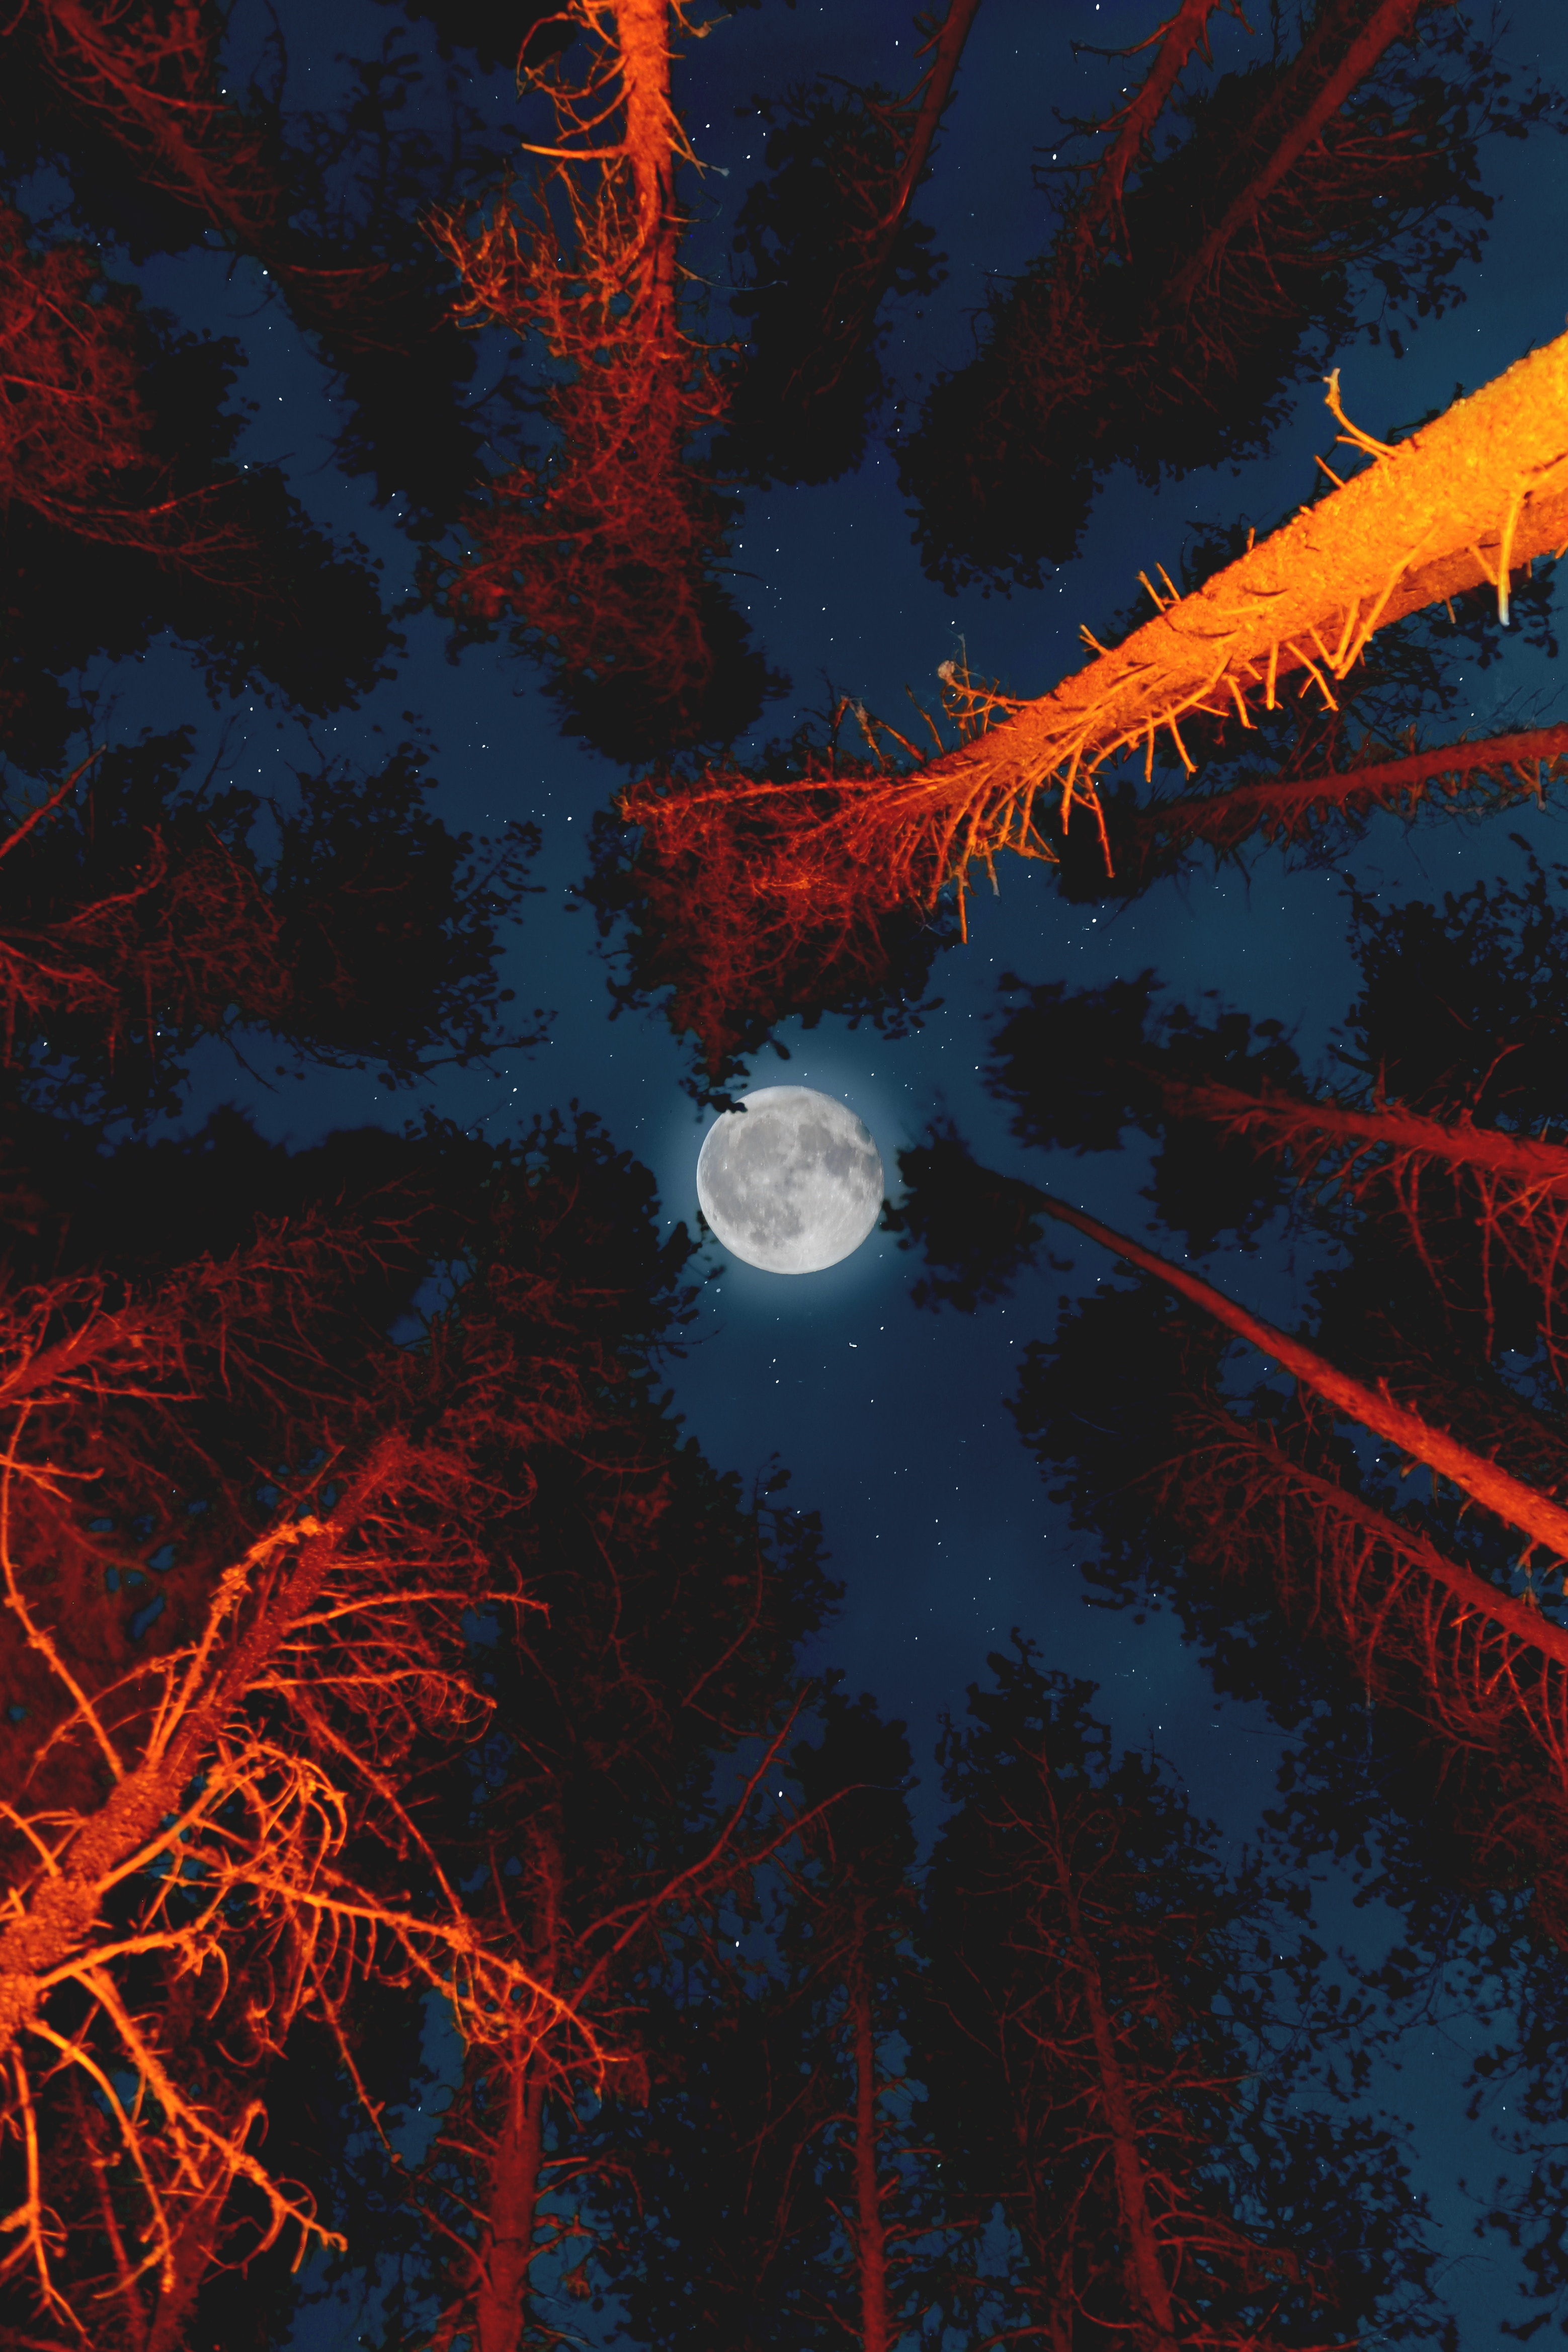 Iphone Wallpaper Aesthetic Moon 3117x4675 Download Hd Wallpaper Wallpapertip